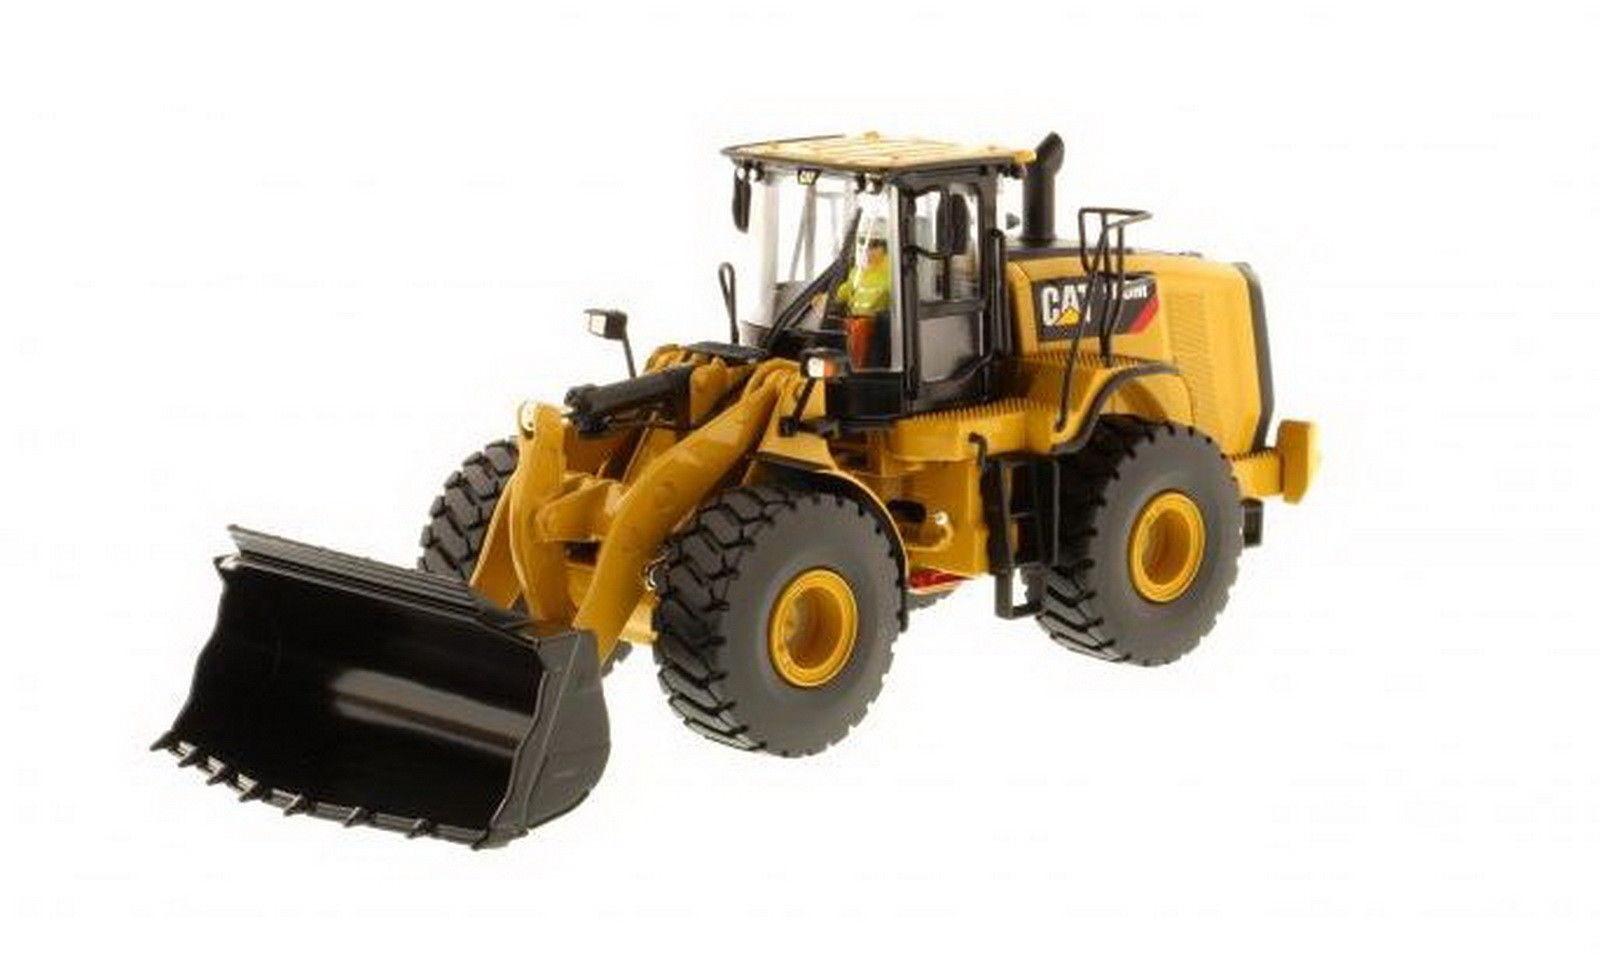 diseños exclusivos 1 50 DM Caterpillar Cat Cat Cat 966M Wheel Loader Diecast Model  85928  El ultimo 2018